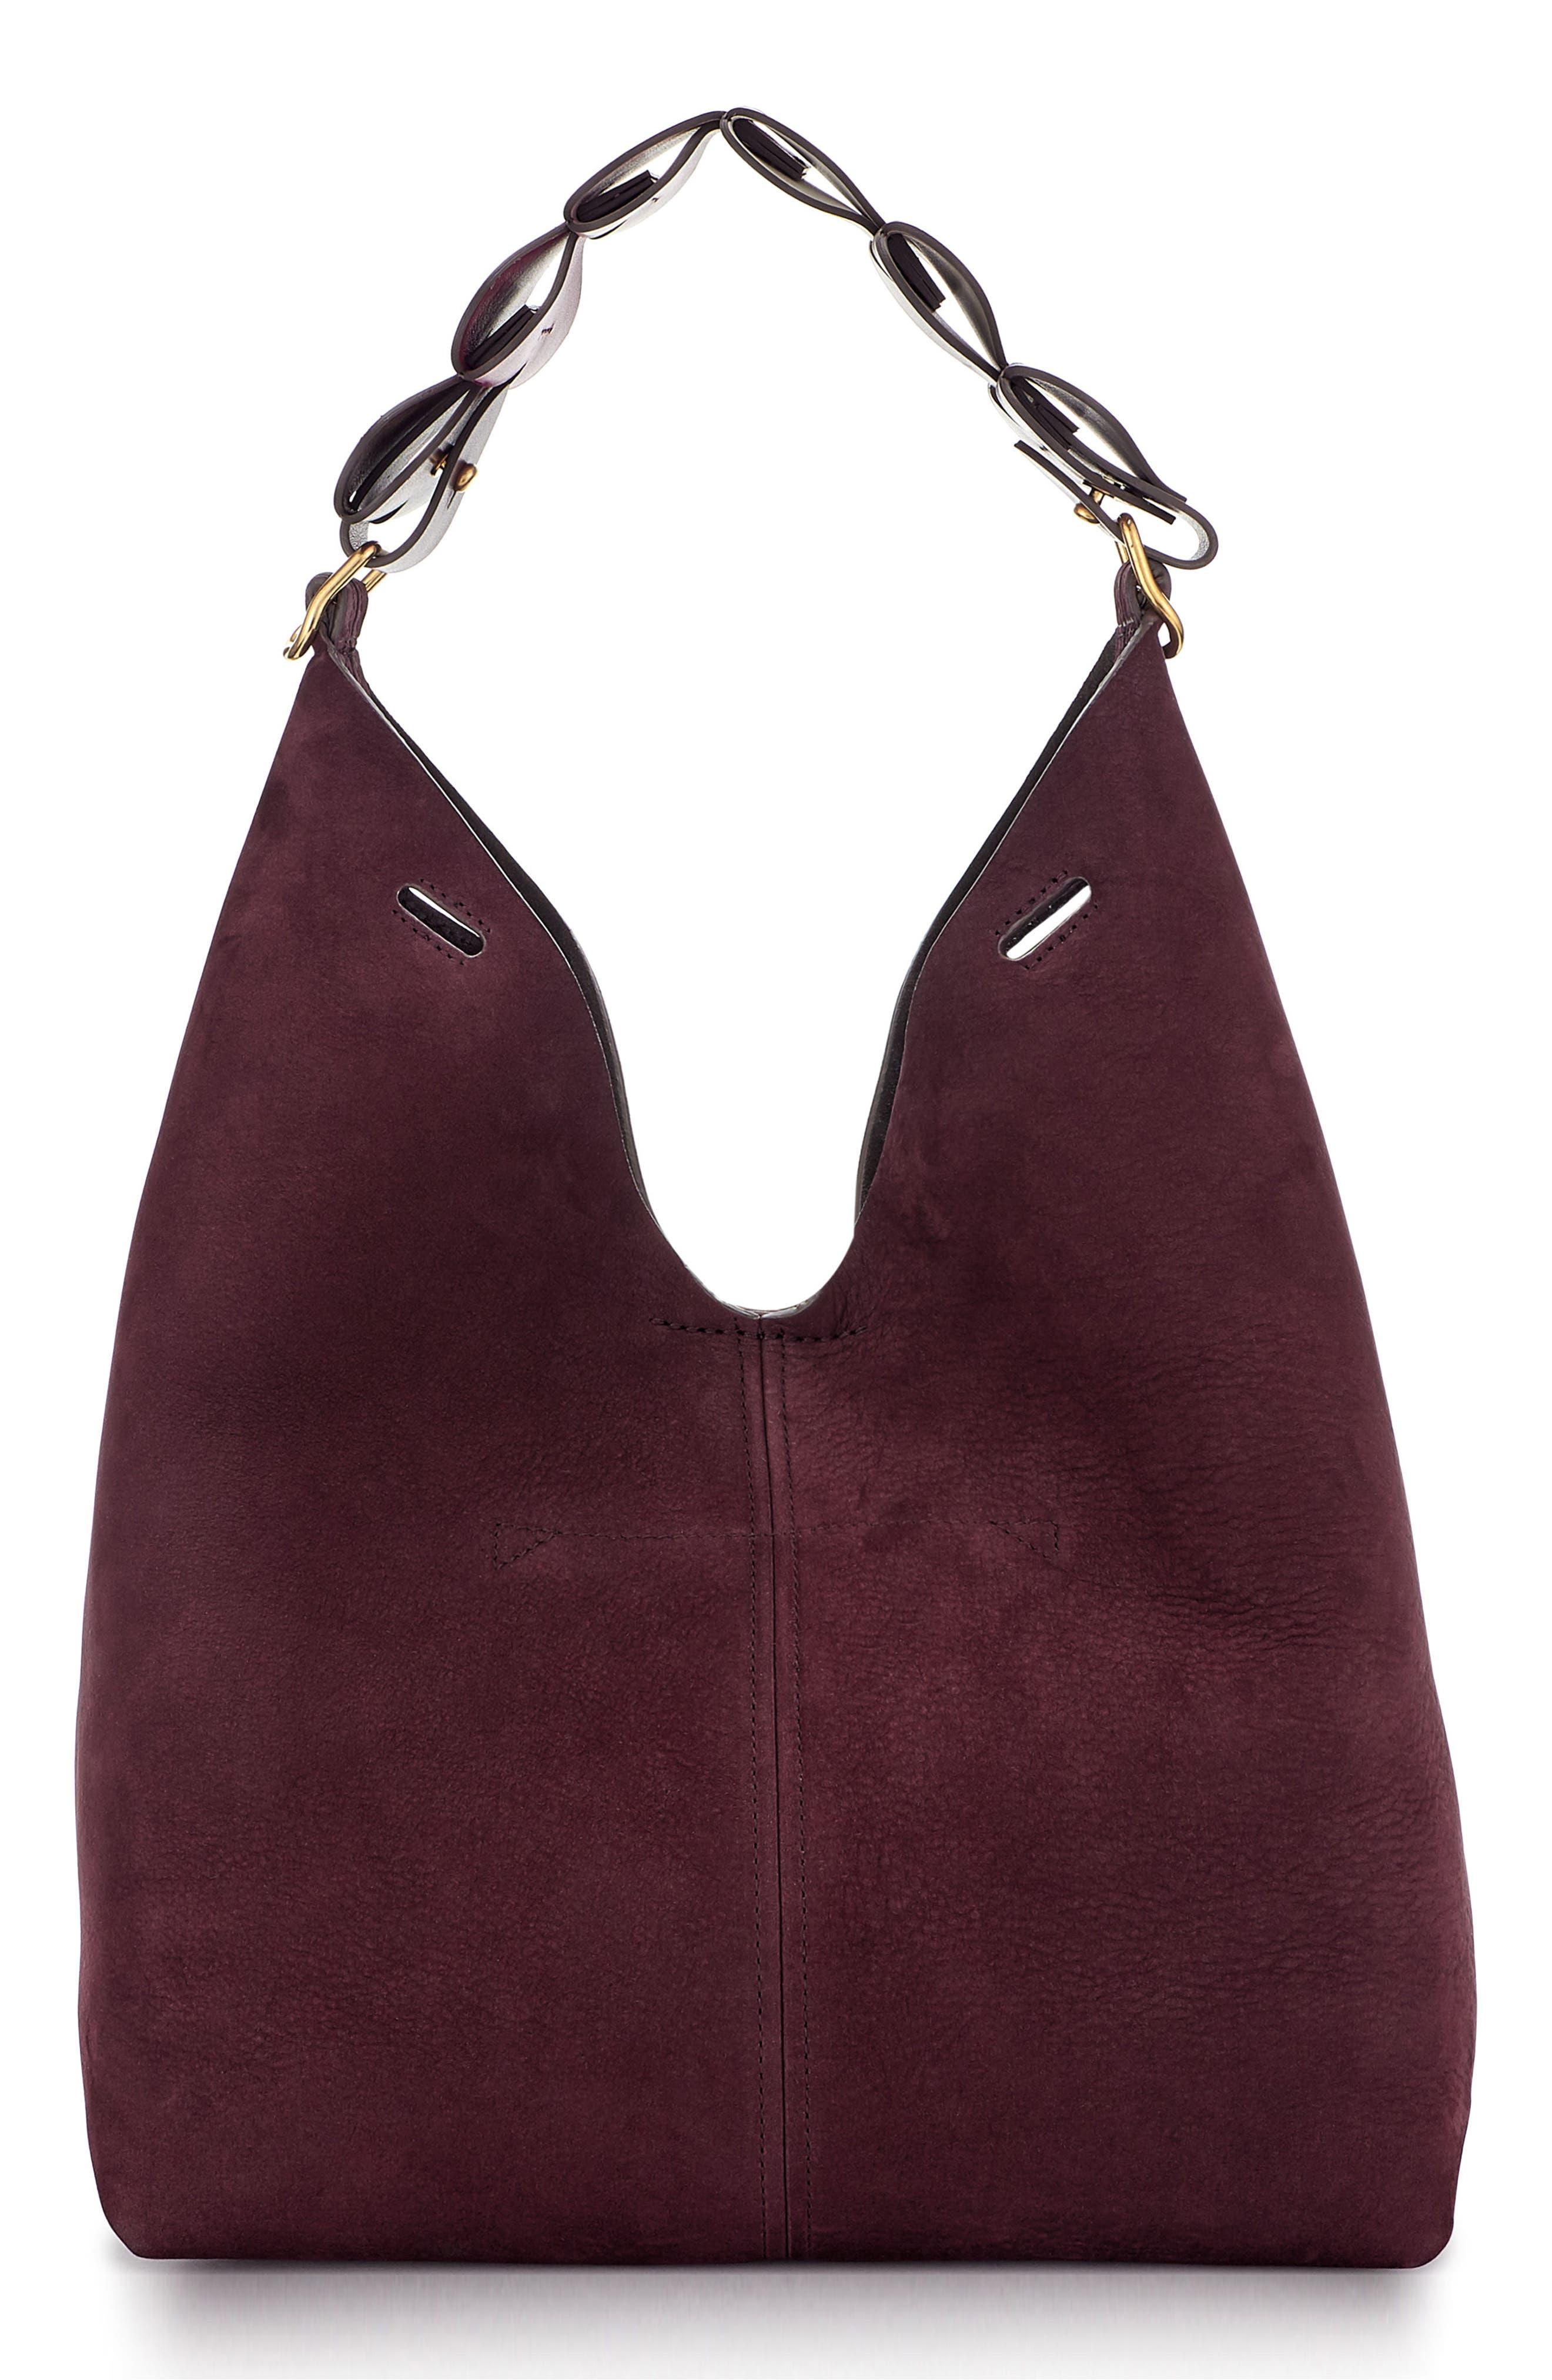 Main Image - Anya Hindmarch Heart Link Small Suede Bucket Bag